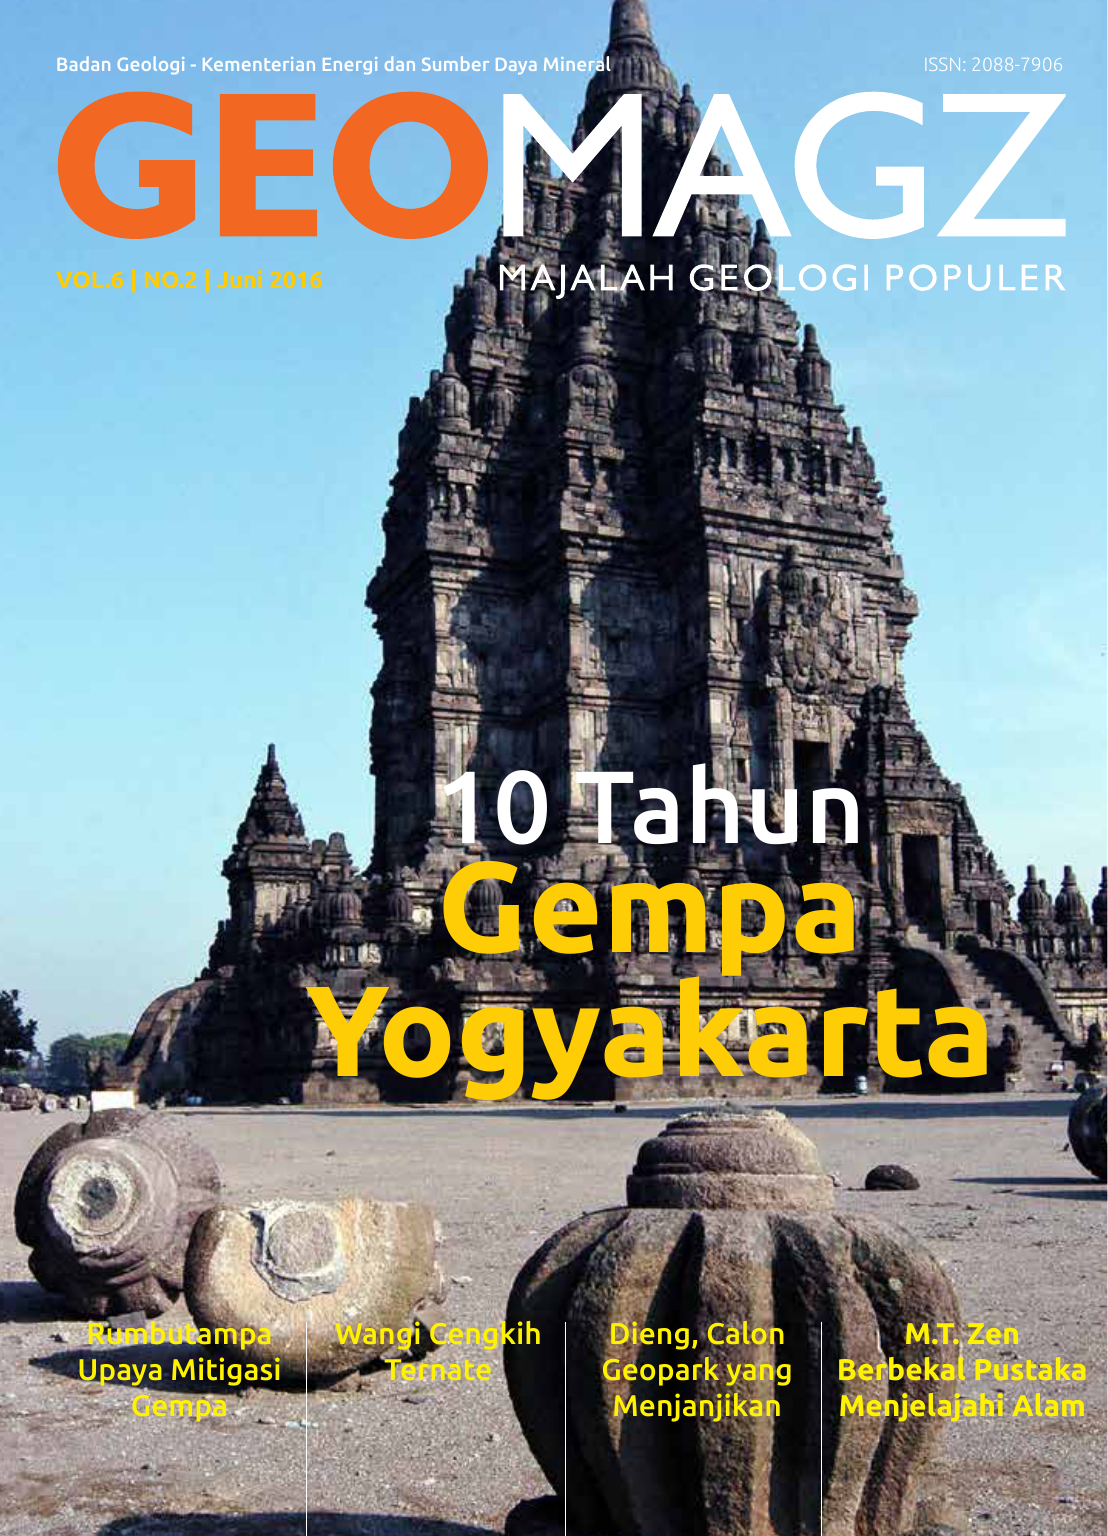 Gempa Yogyakarta Geomagz